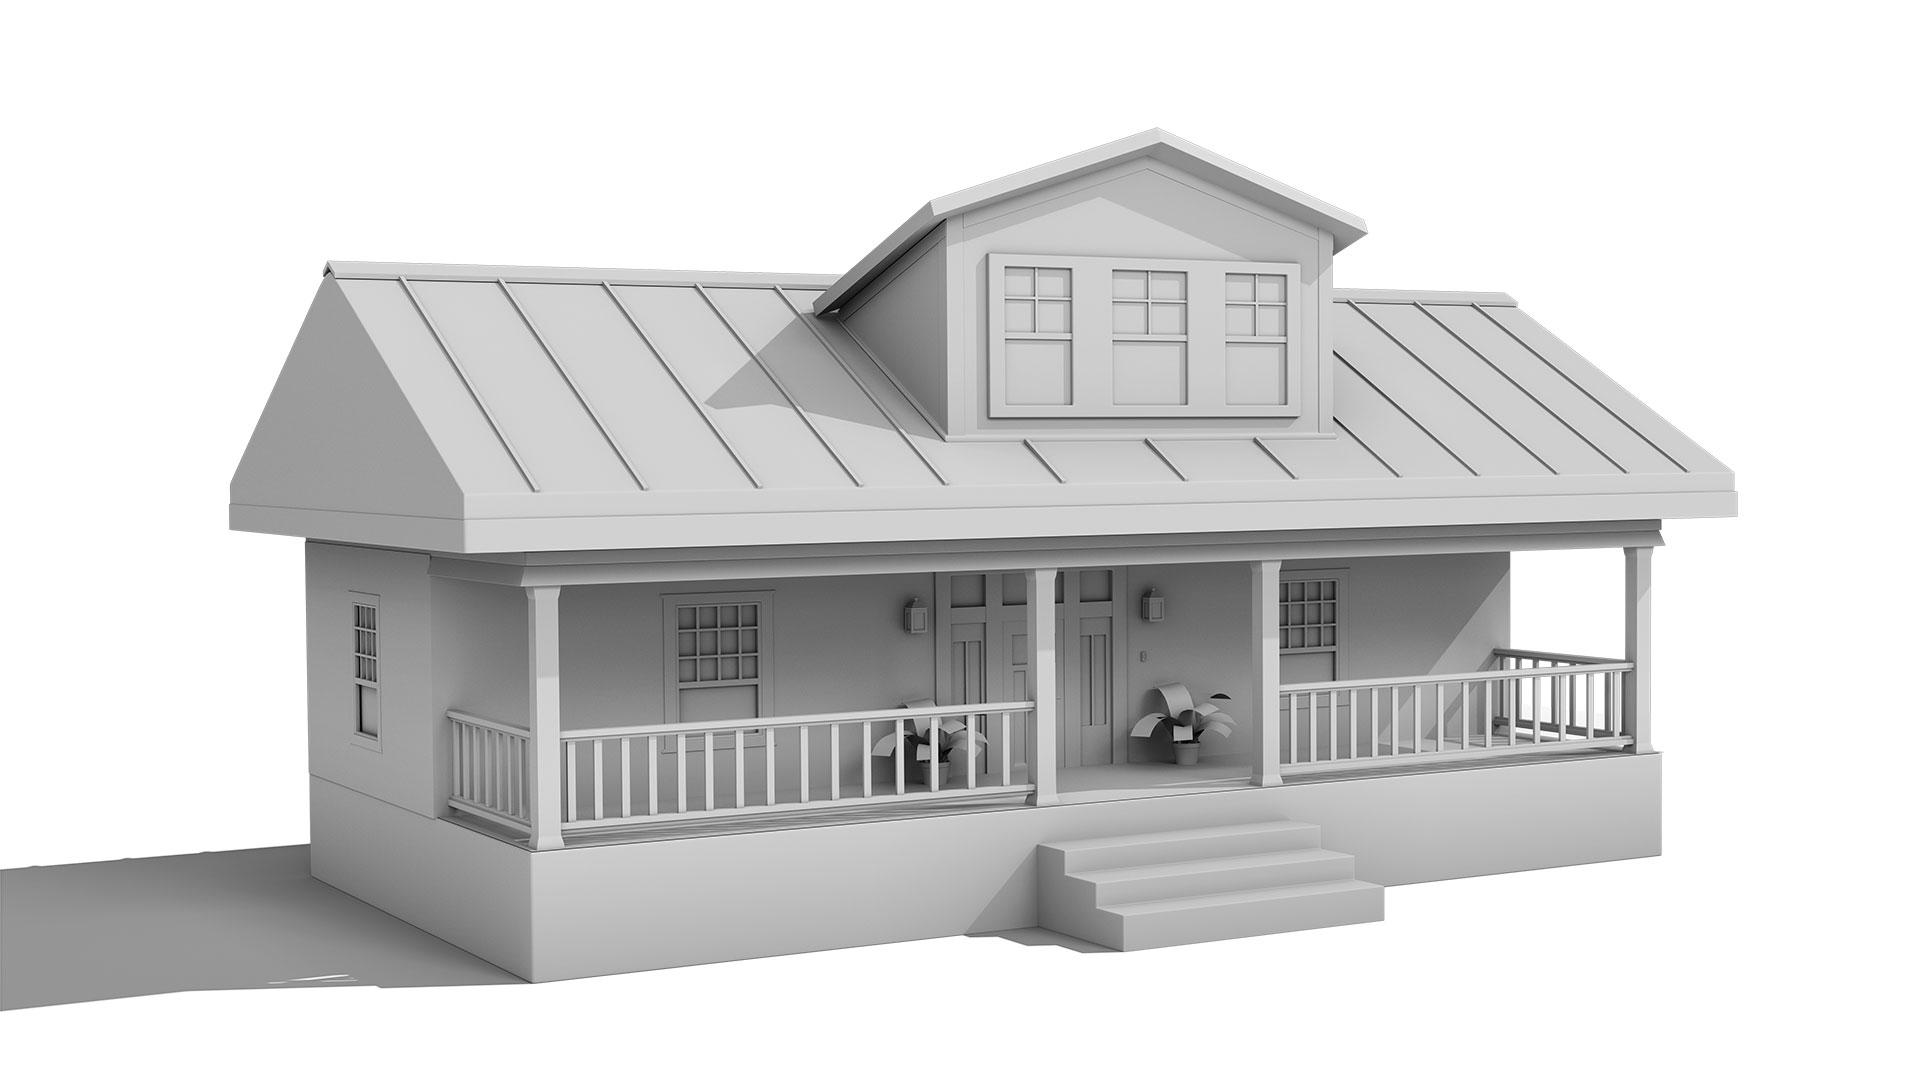 Blue Wooden House 3d Model Free Download 3d Model